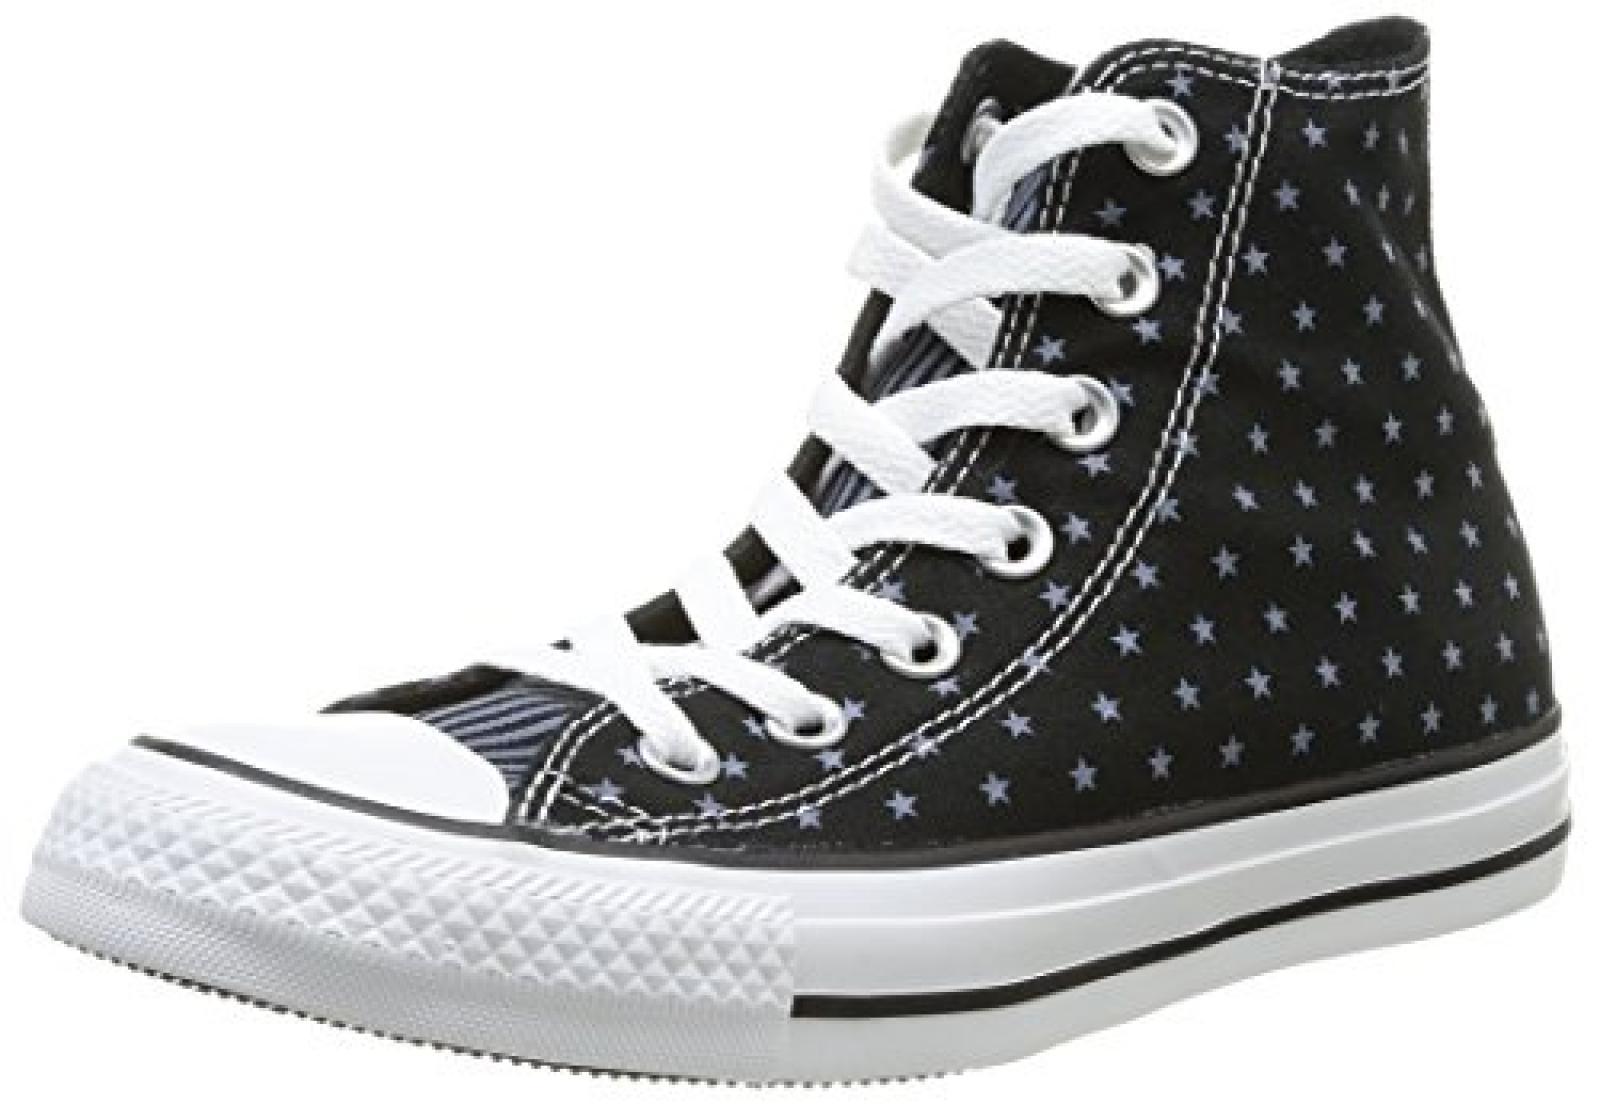 Converse Chuck Taylor All Star Femme Plus Star Hi 381120 Damen Sneaker